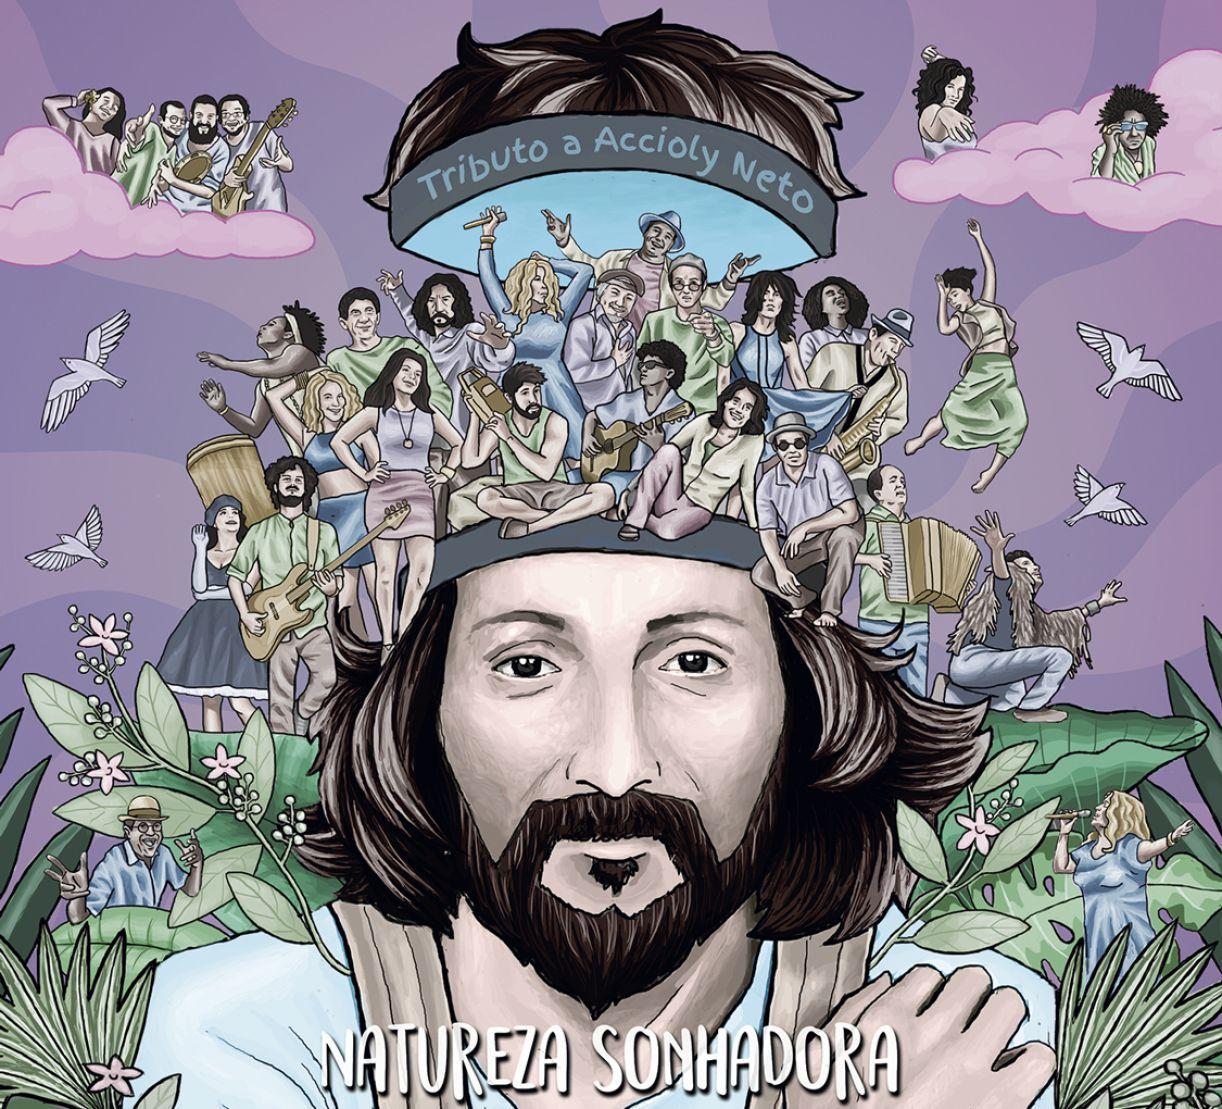 O disco 'Natureza sonhadora' foi idealizado pela filha do artista, a produtora Talitha Accioly